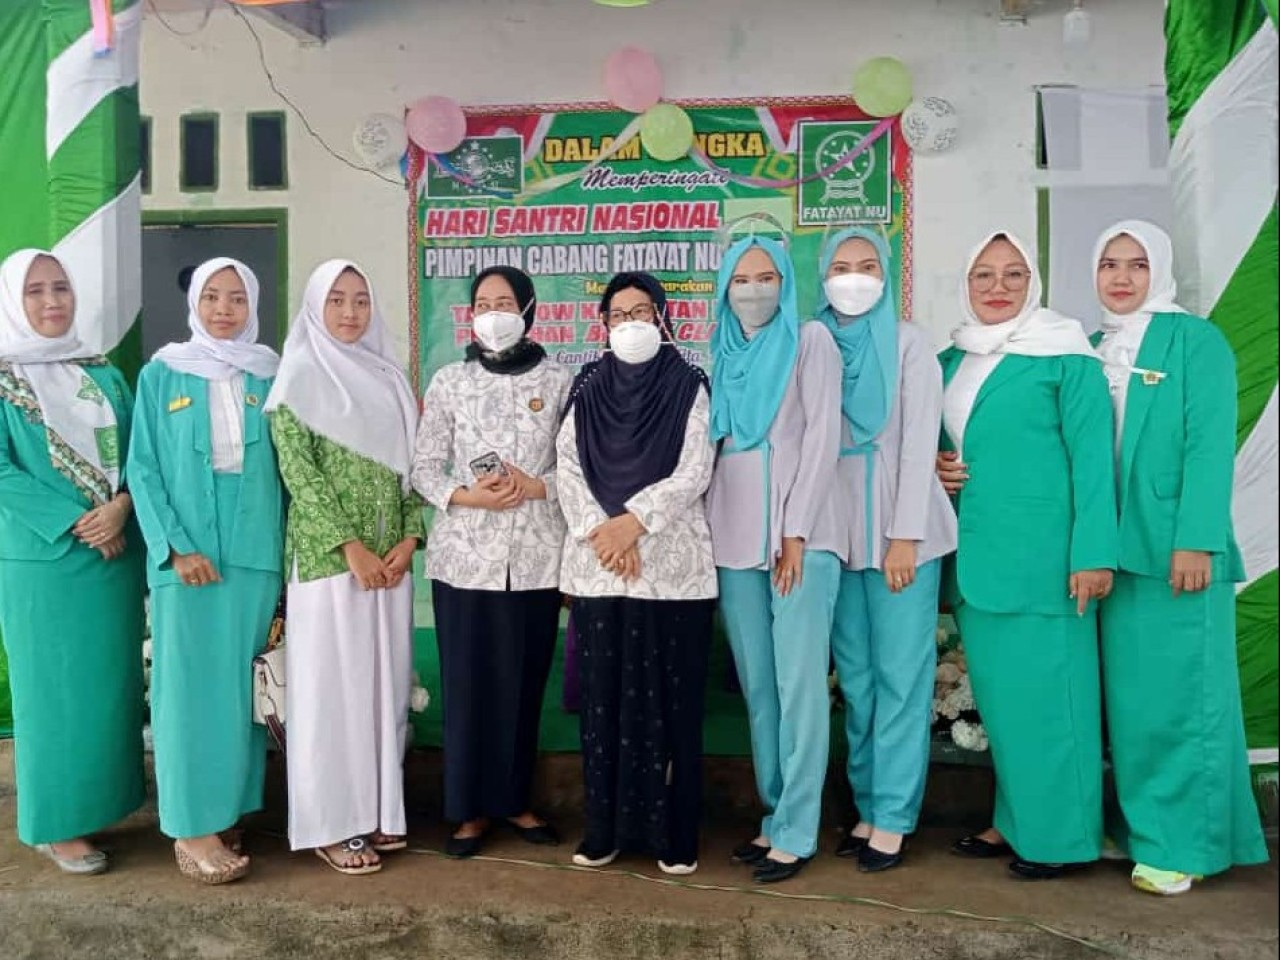 Semarakkan Hari Santri, Fatayat NU Tuba Gelar Talkshow Kesehatan dan Pelatihan Kecantikan